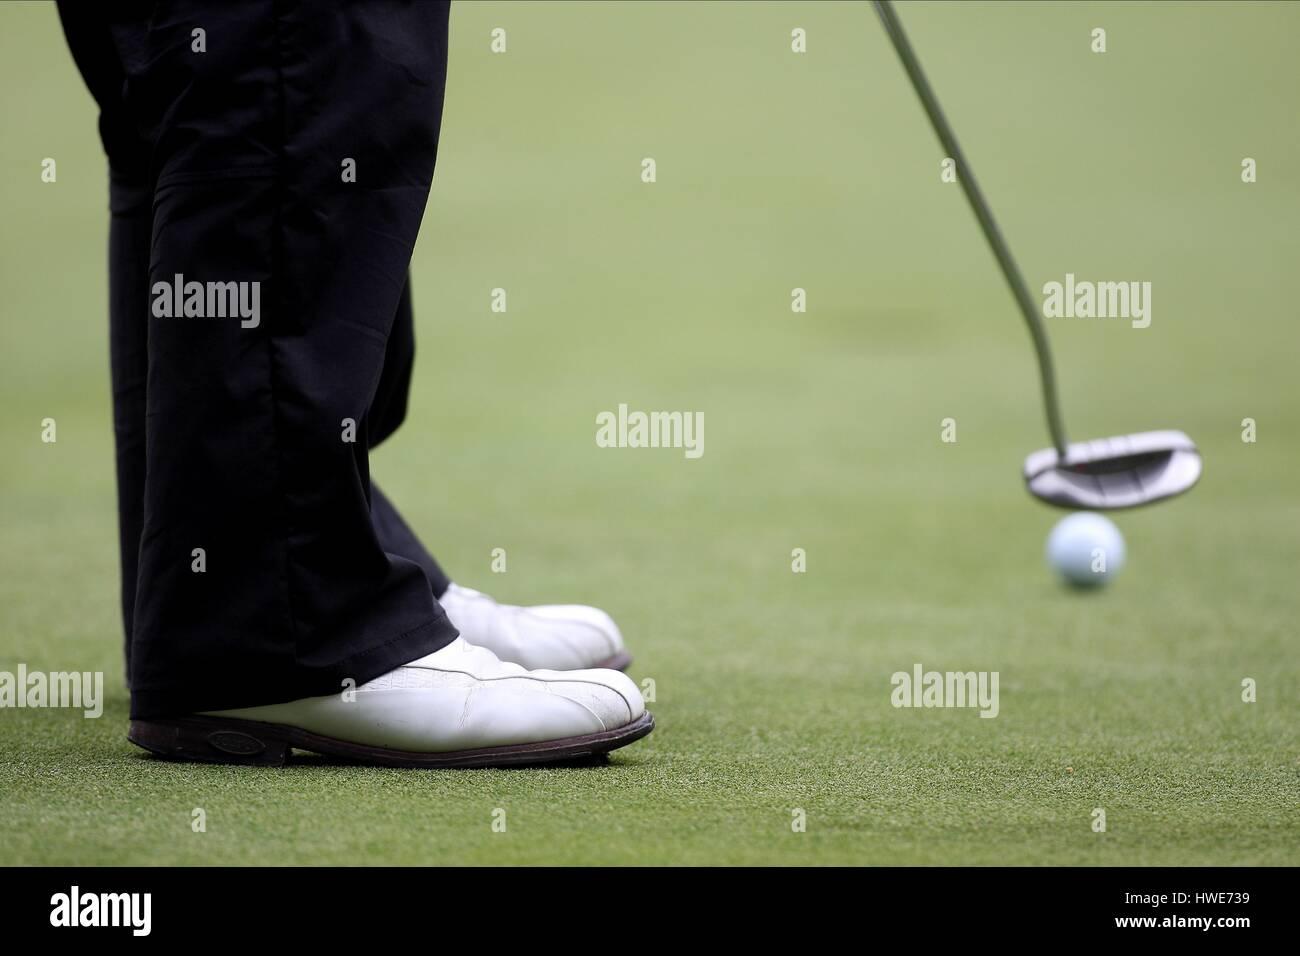 GOLFER PUTTING PGA CHAMPIONSHIP WENTWORTH CLUB SURREY ENGLAND 22 May 2009 - Stock Image